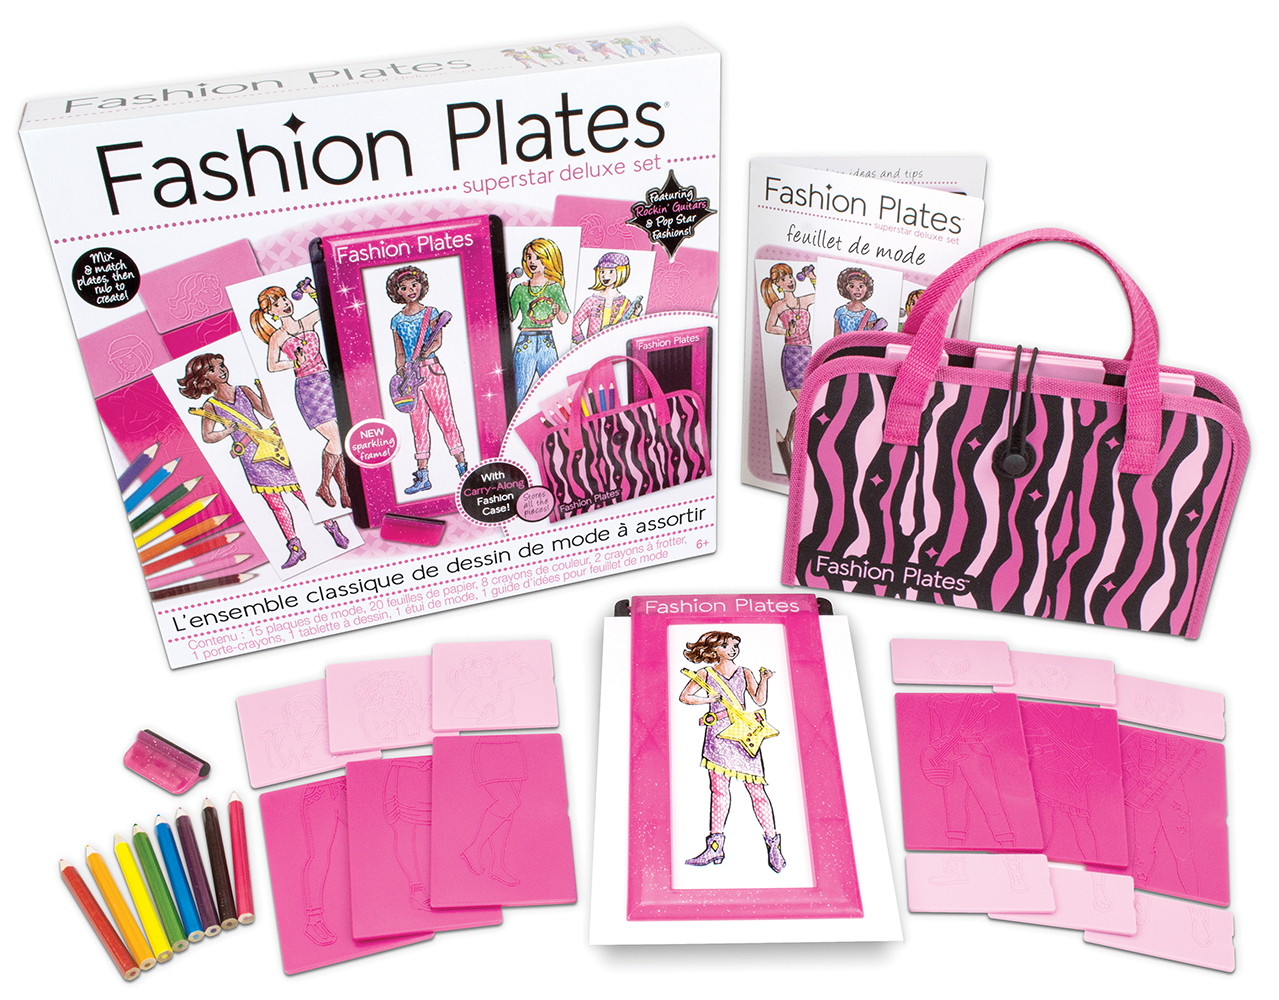 Fashion Plates - Ensemble de luxe Superstar